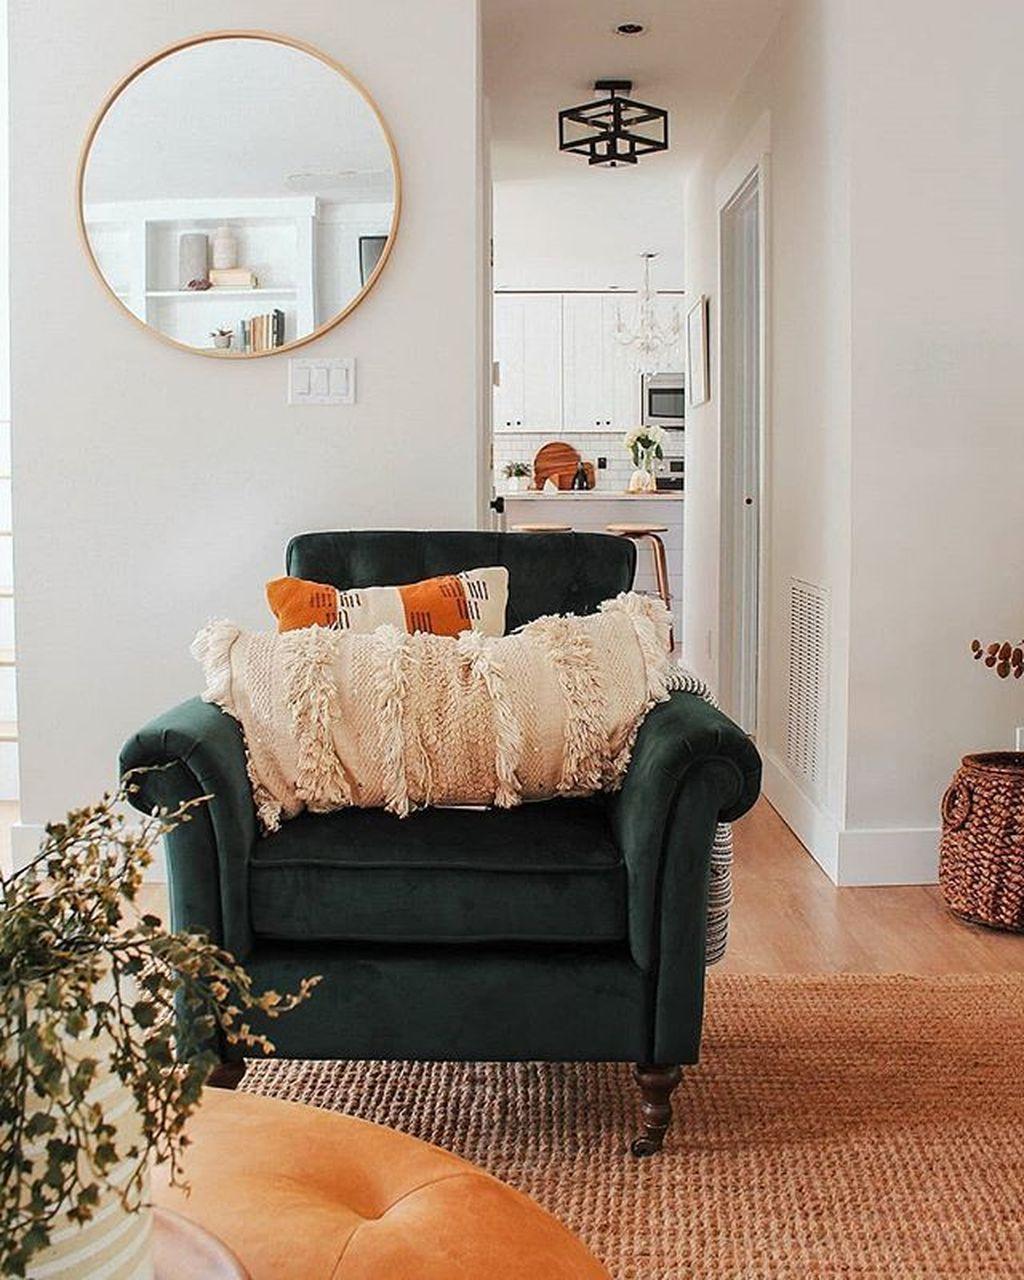 20 Famous Christmas Decor Ideas For Your Apartment Trenduhome Home Home Decor Inspiration House Interior